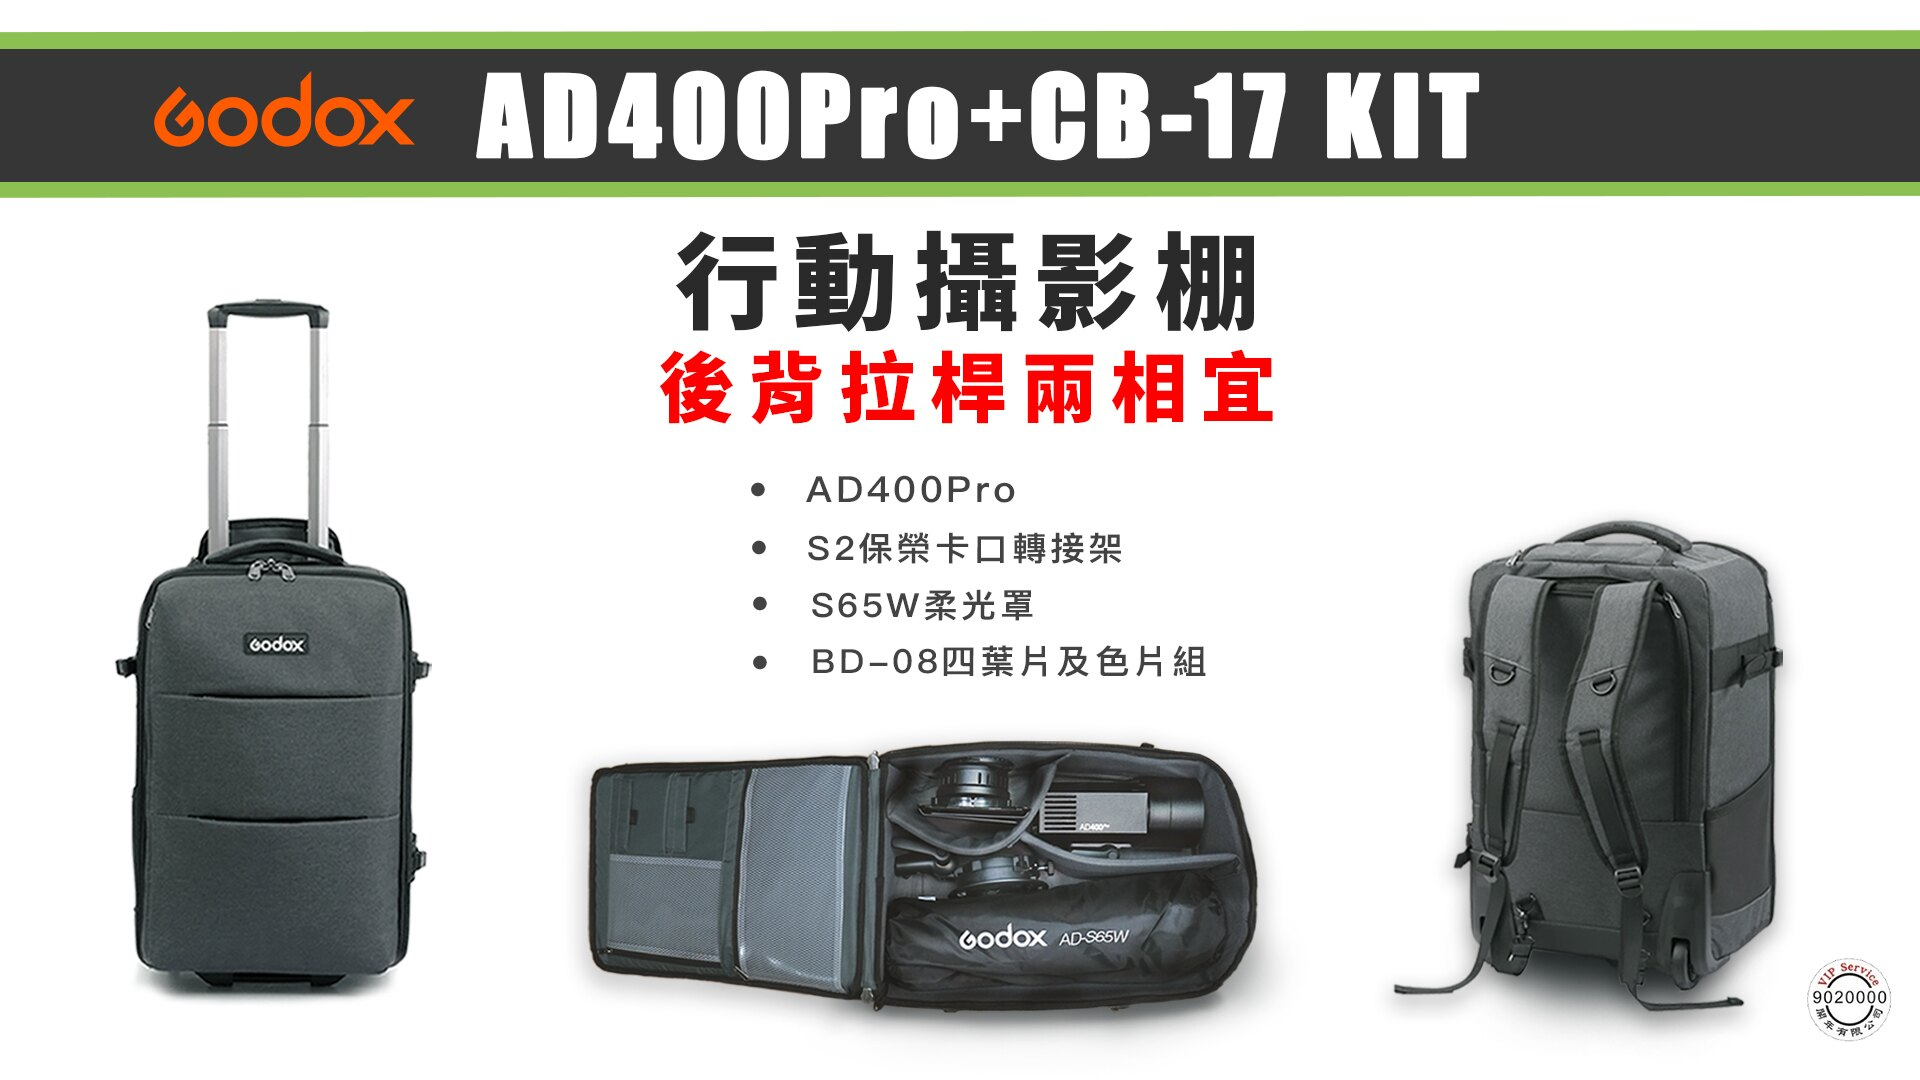 Godox 神牛 AD400PRO+CB-17 KIT 後背拉桿(AD400Pro+CB-17 Kit公司貨)